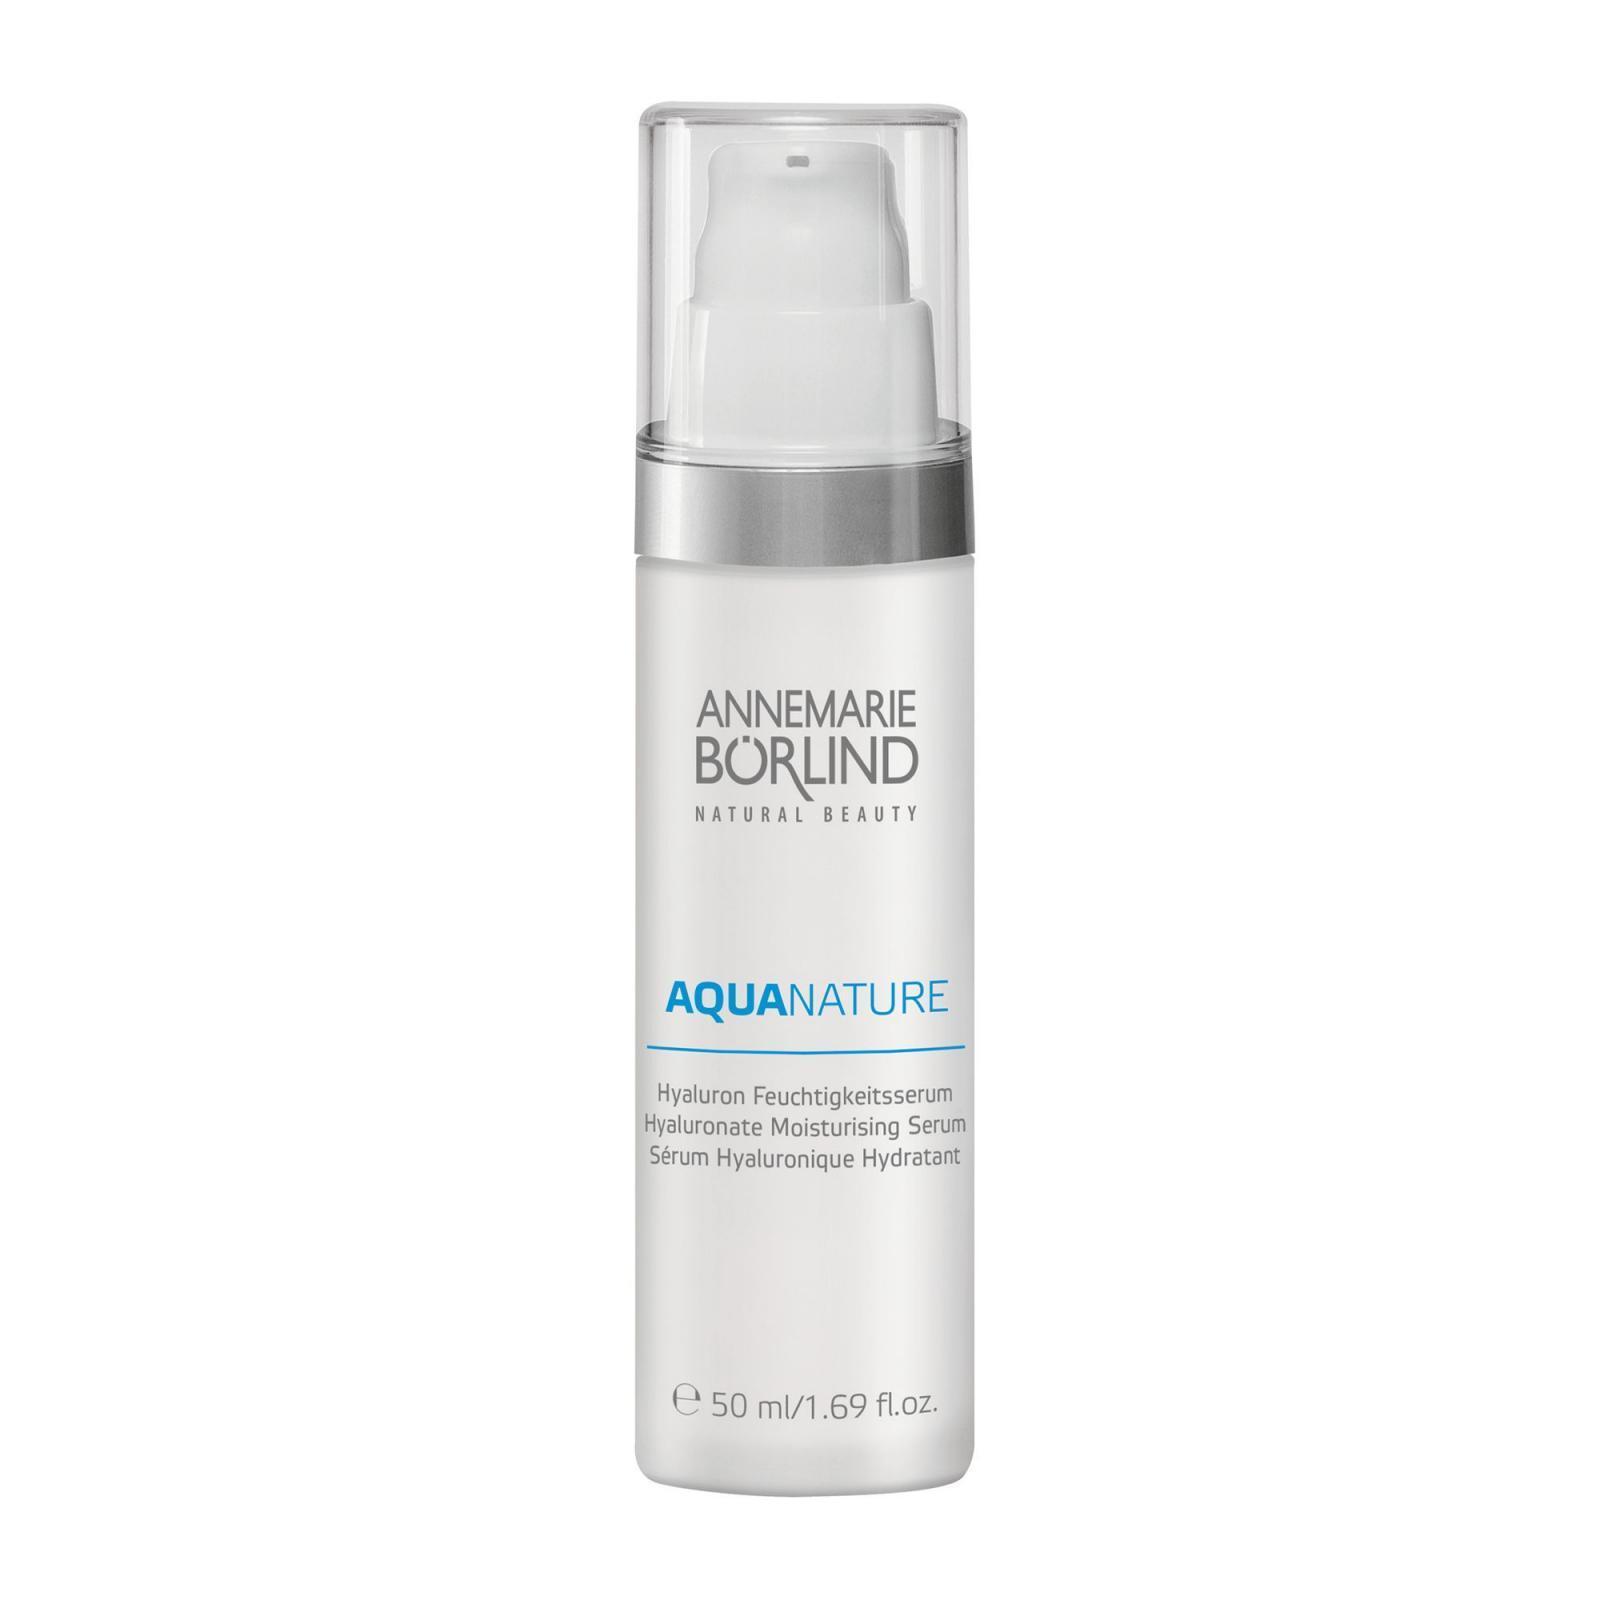 Annemarie Börlind Hyaluronové hydratační sérum, Aquanature 50 ml